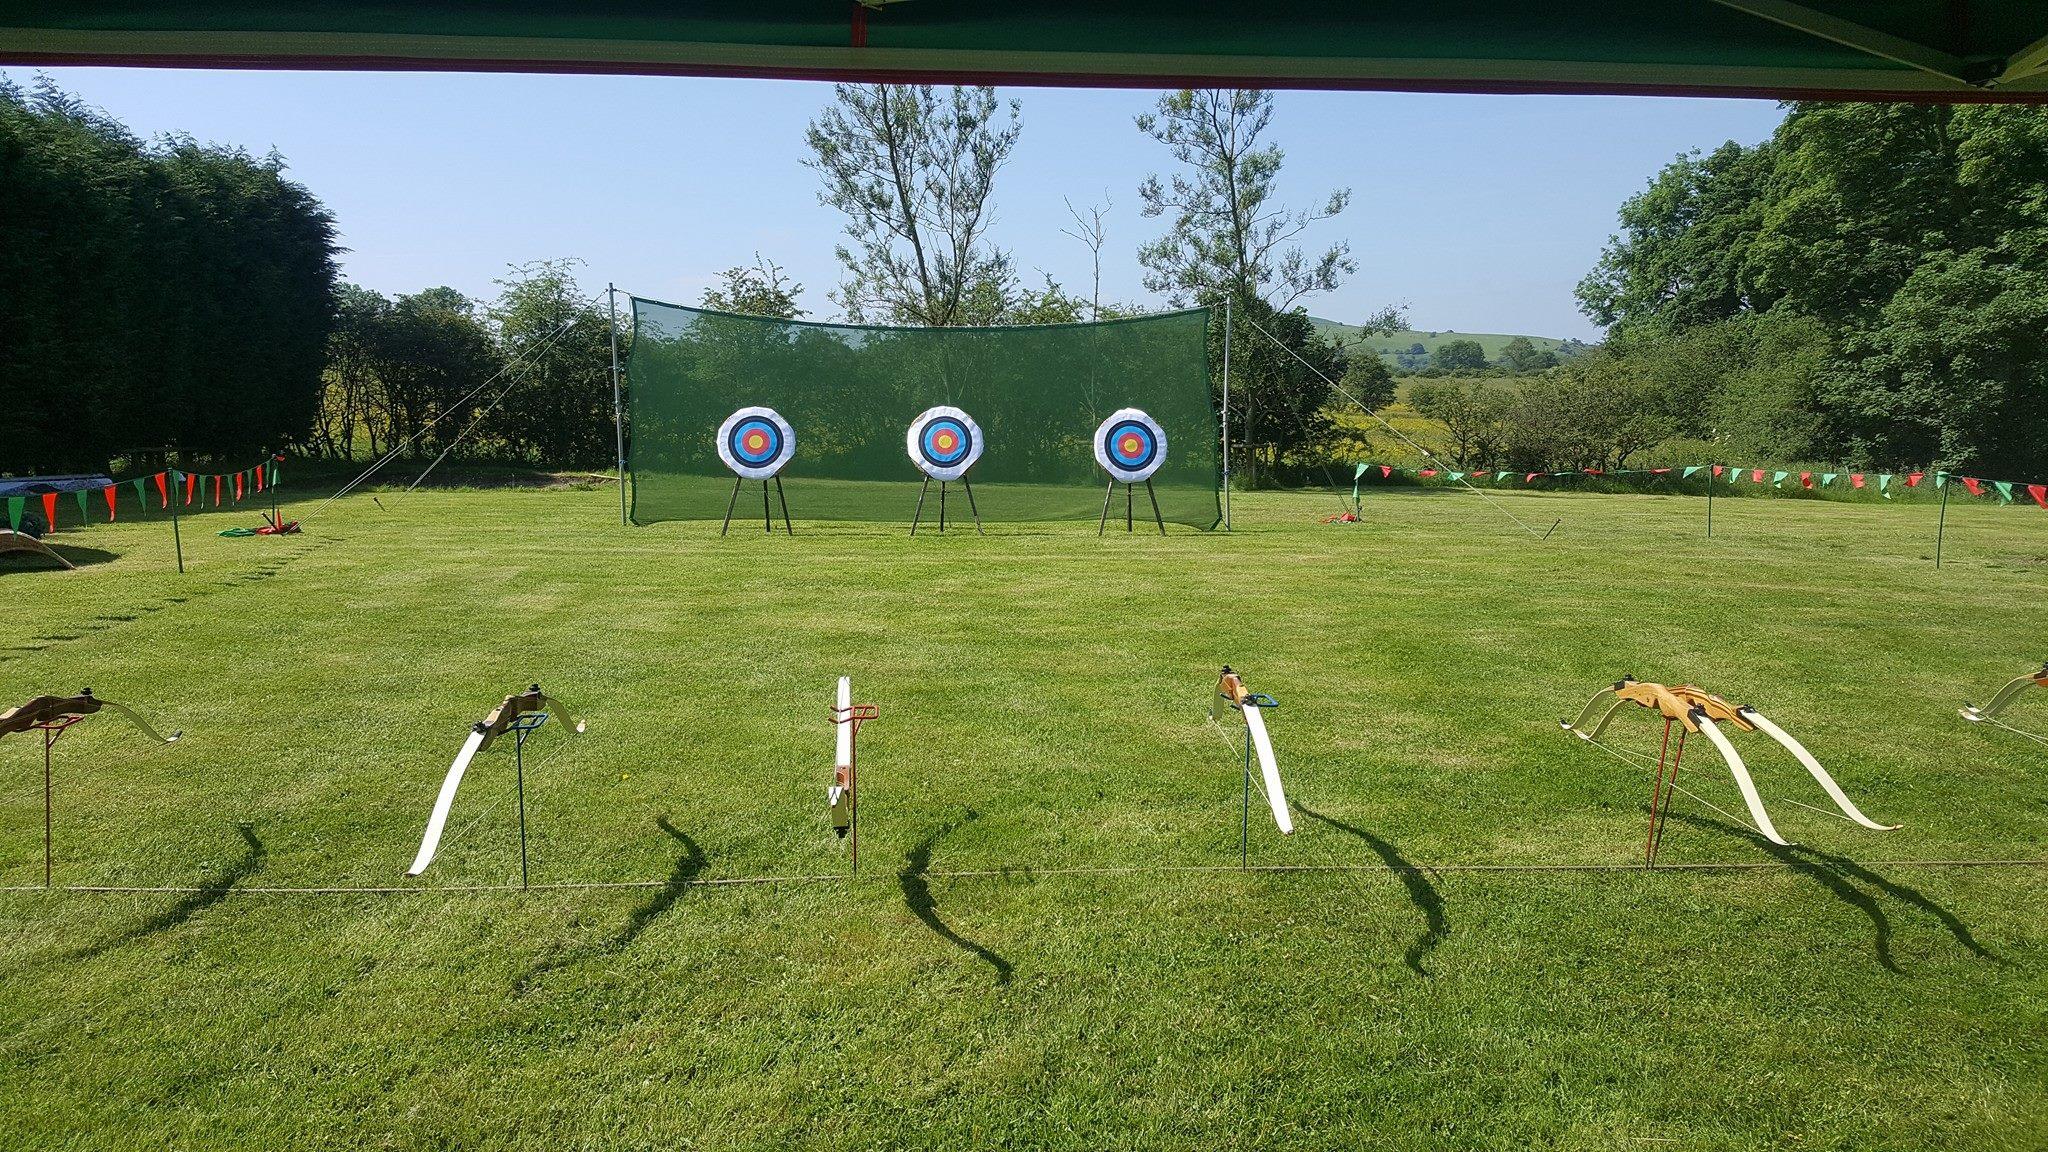 sporting activities in Derbyshire